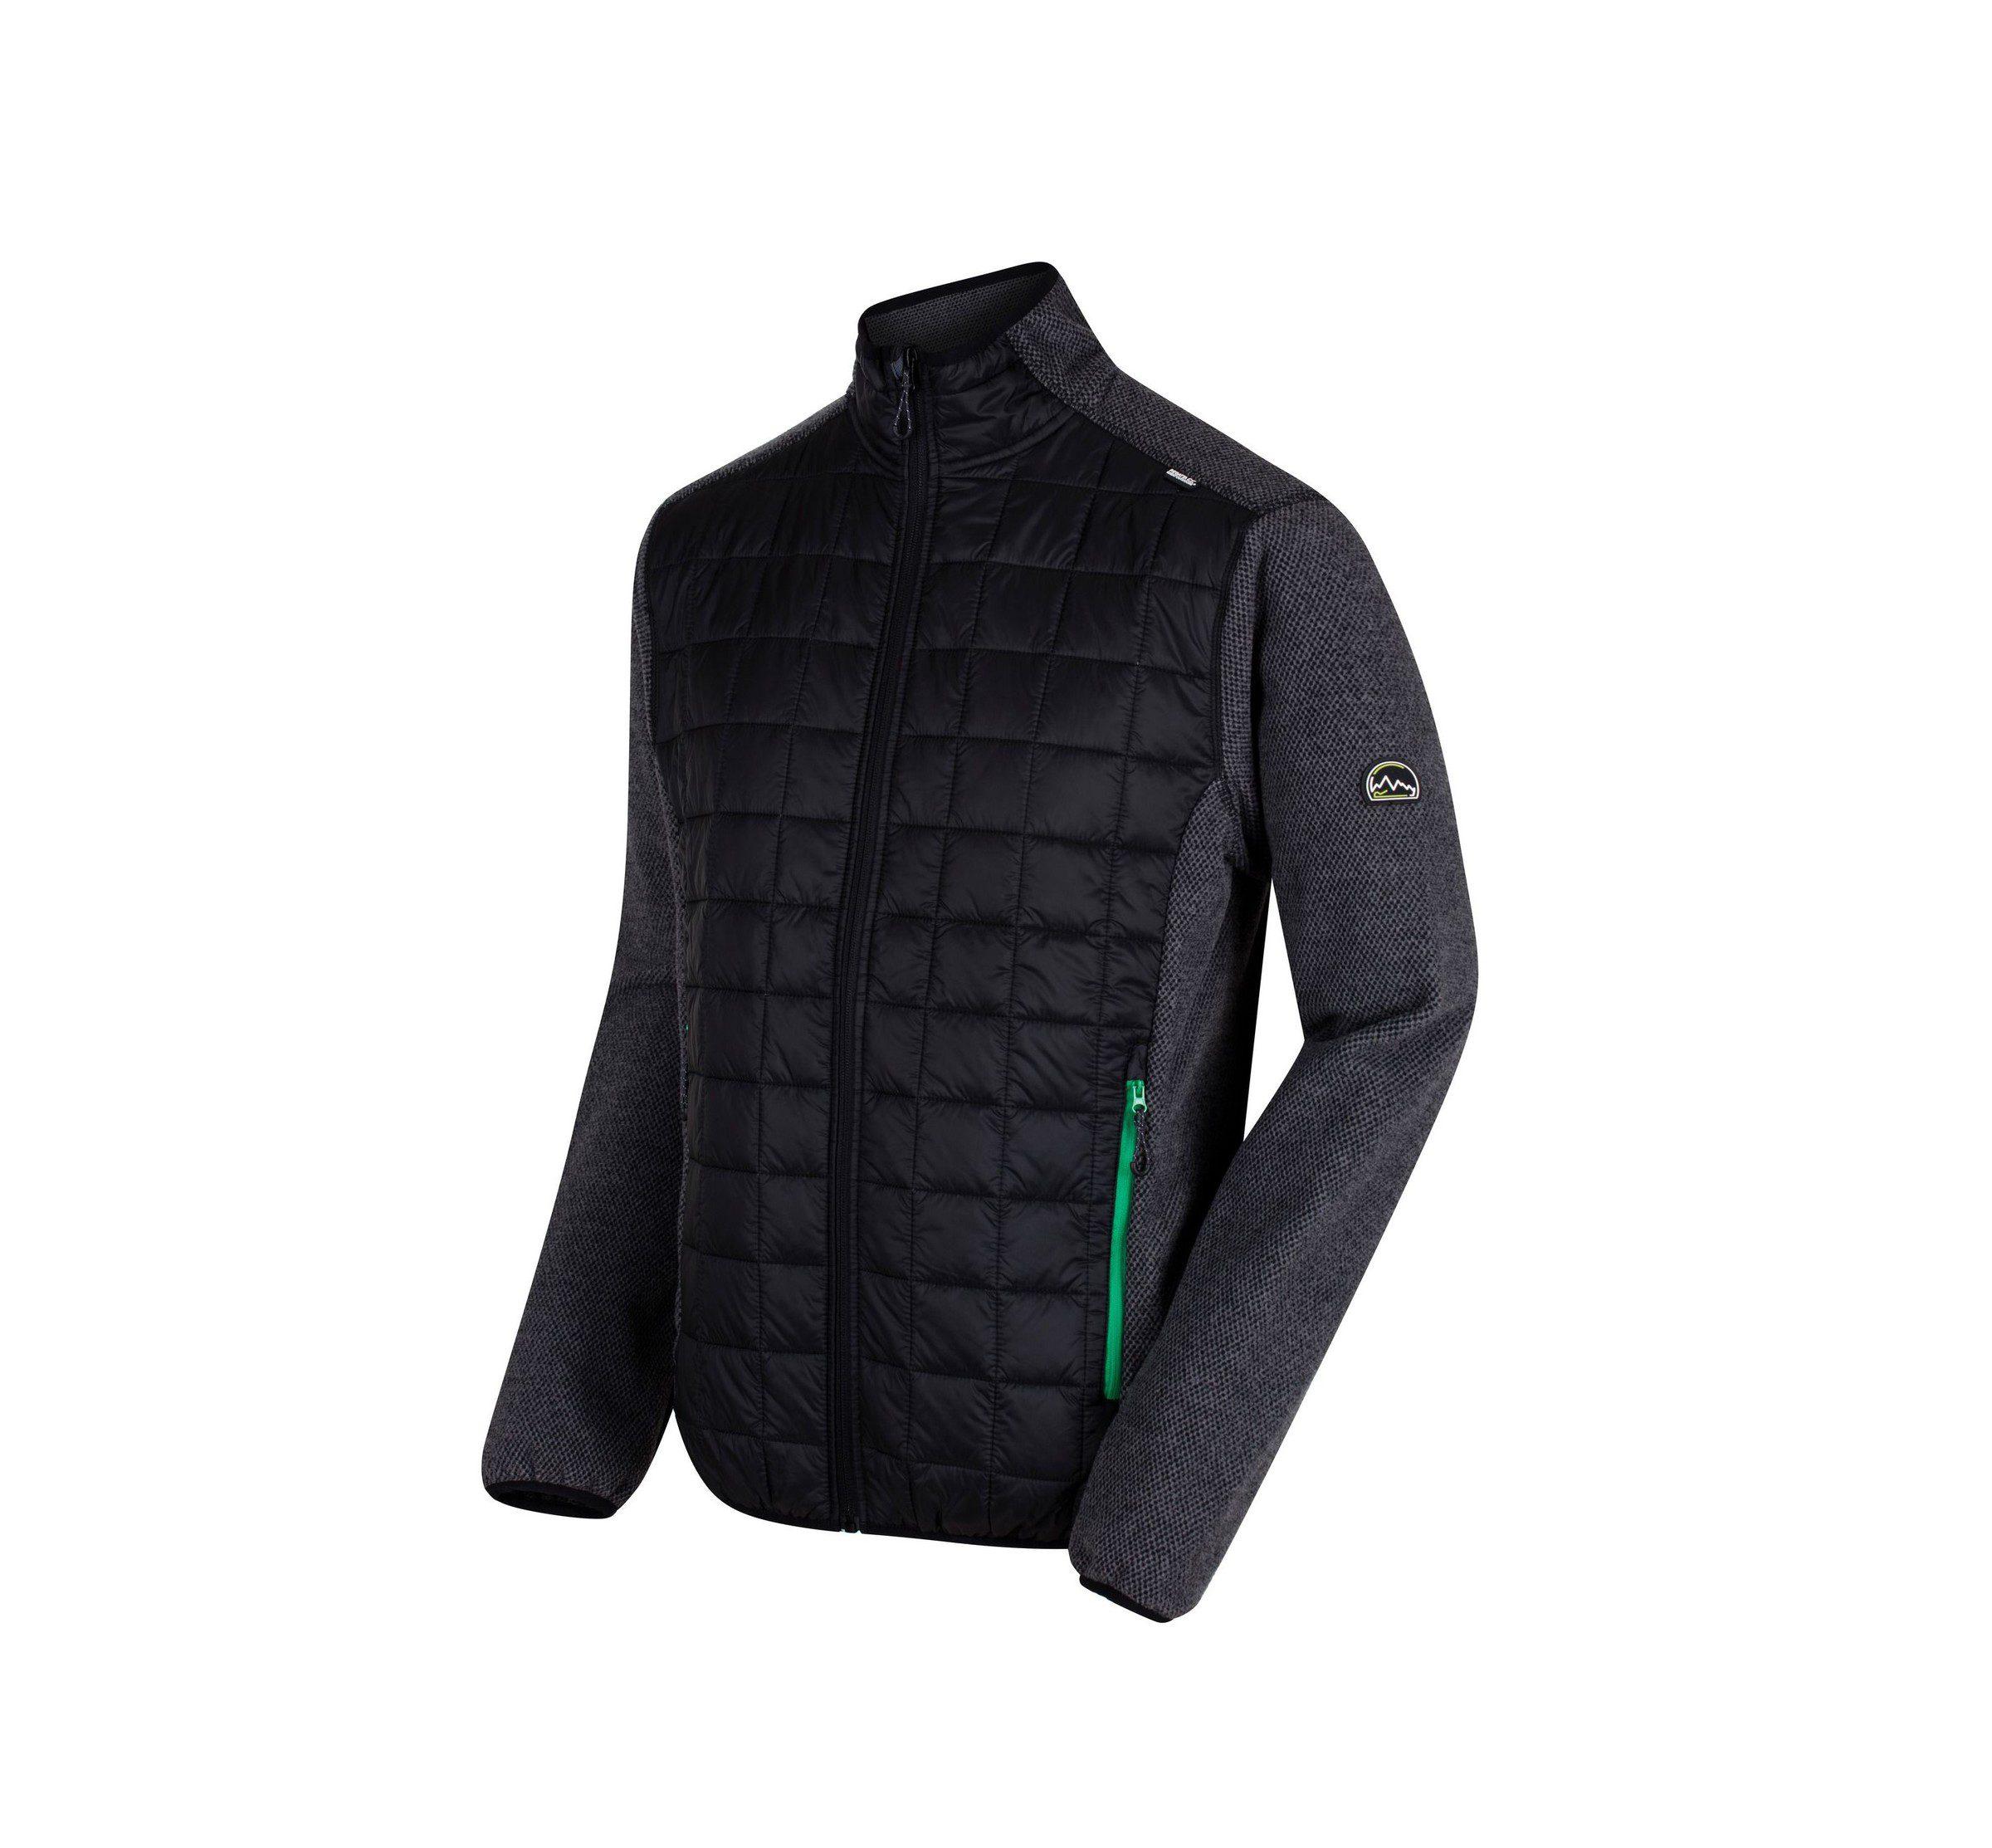 Regatta Men's Chilton II Hybrid Jacket - Lead Grey / Black